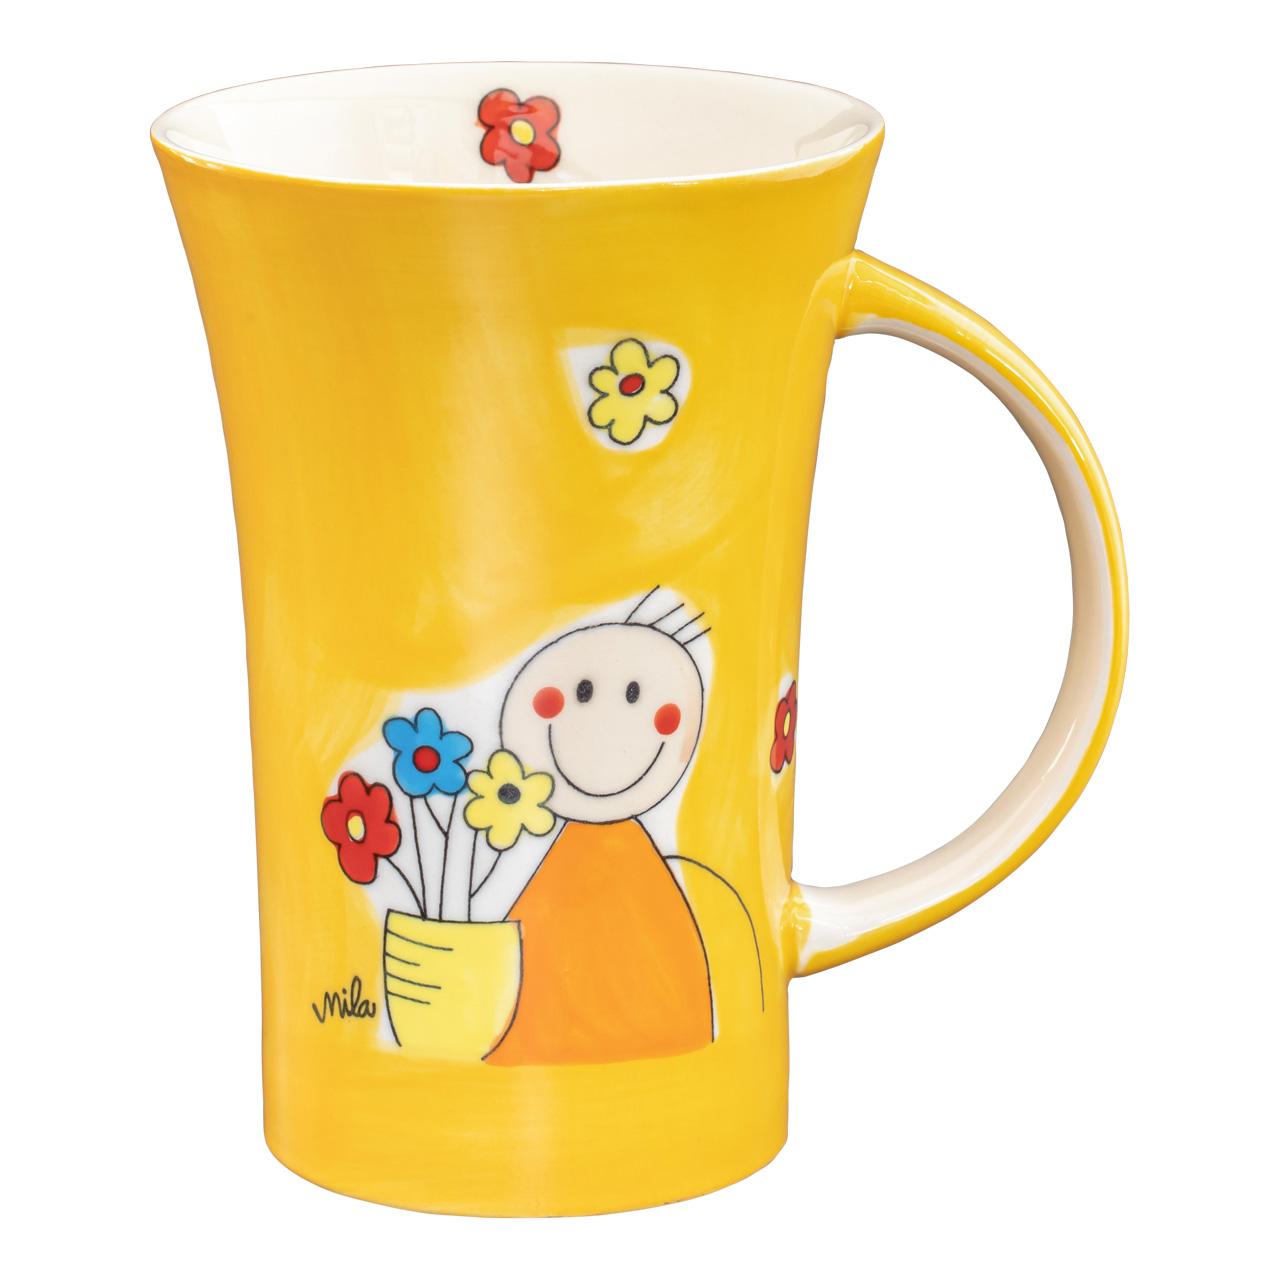 Coffee Pot - Flowerboy